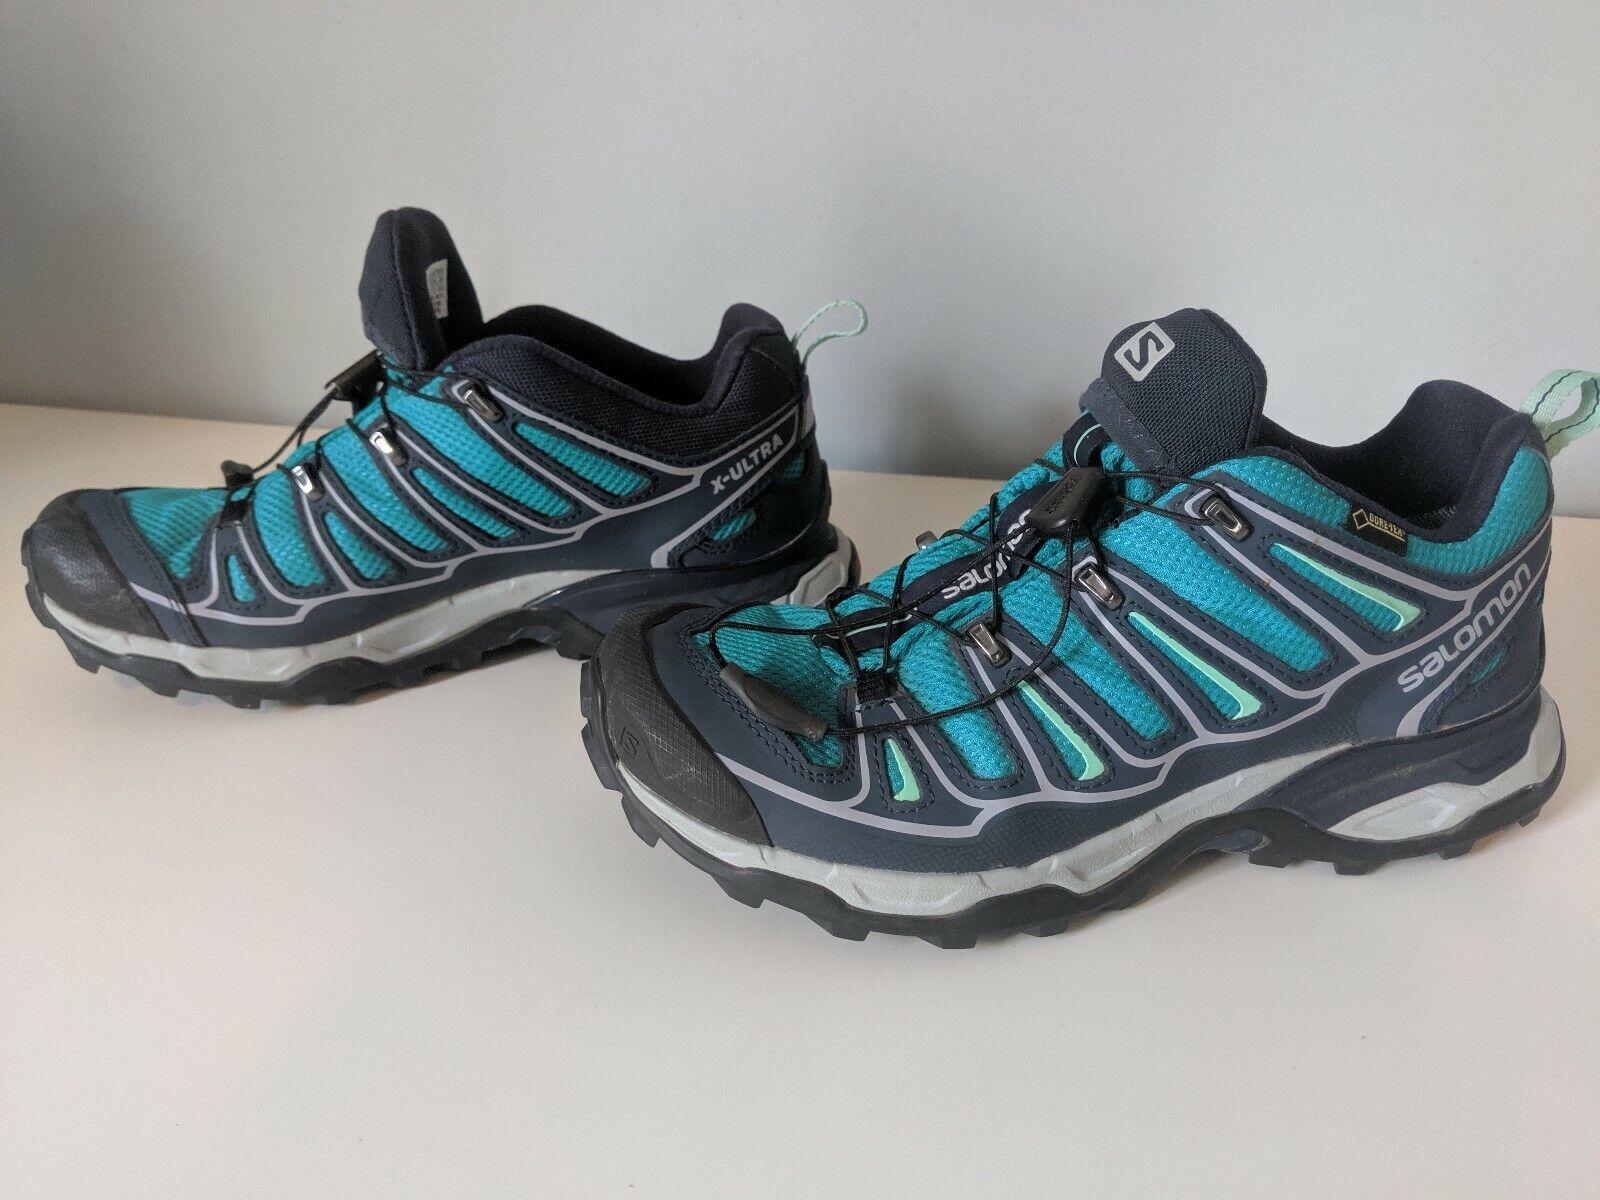 Salomon Women's X  Ultra Low GTX Gore-Tex Trail Running shoes - Euro 39.5   US 7.5  cheaper prices